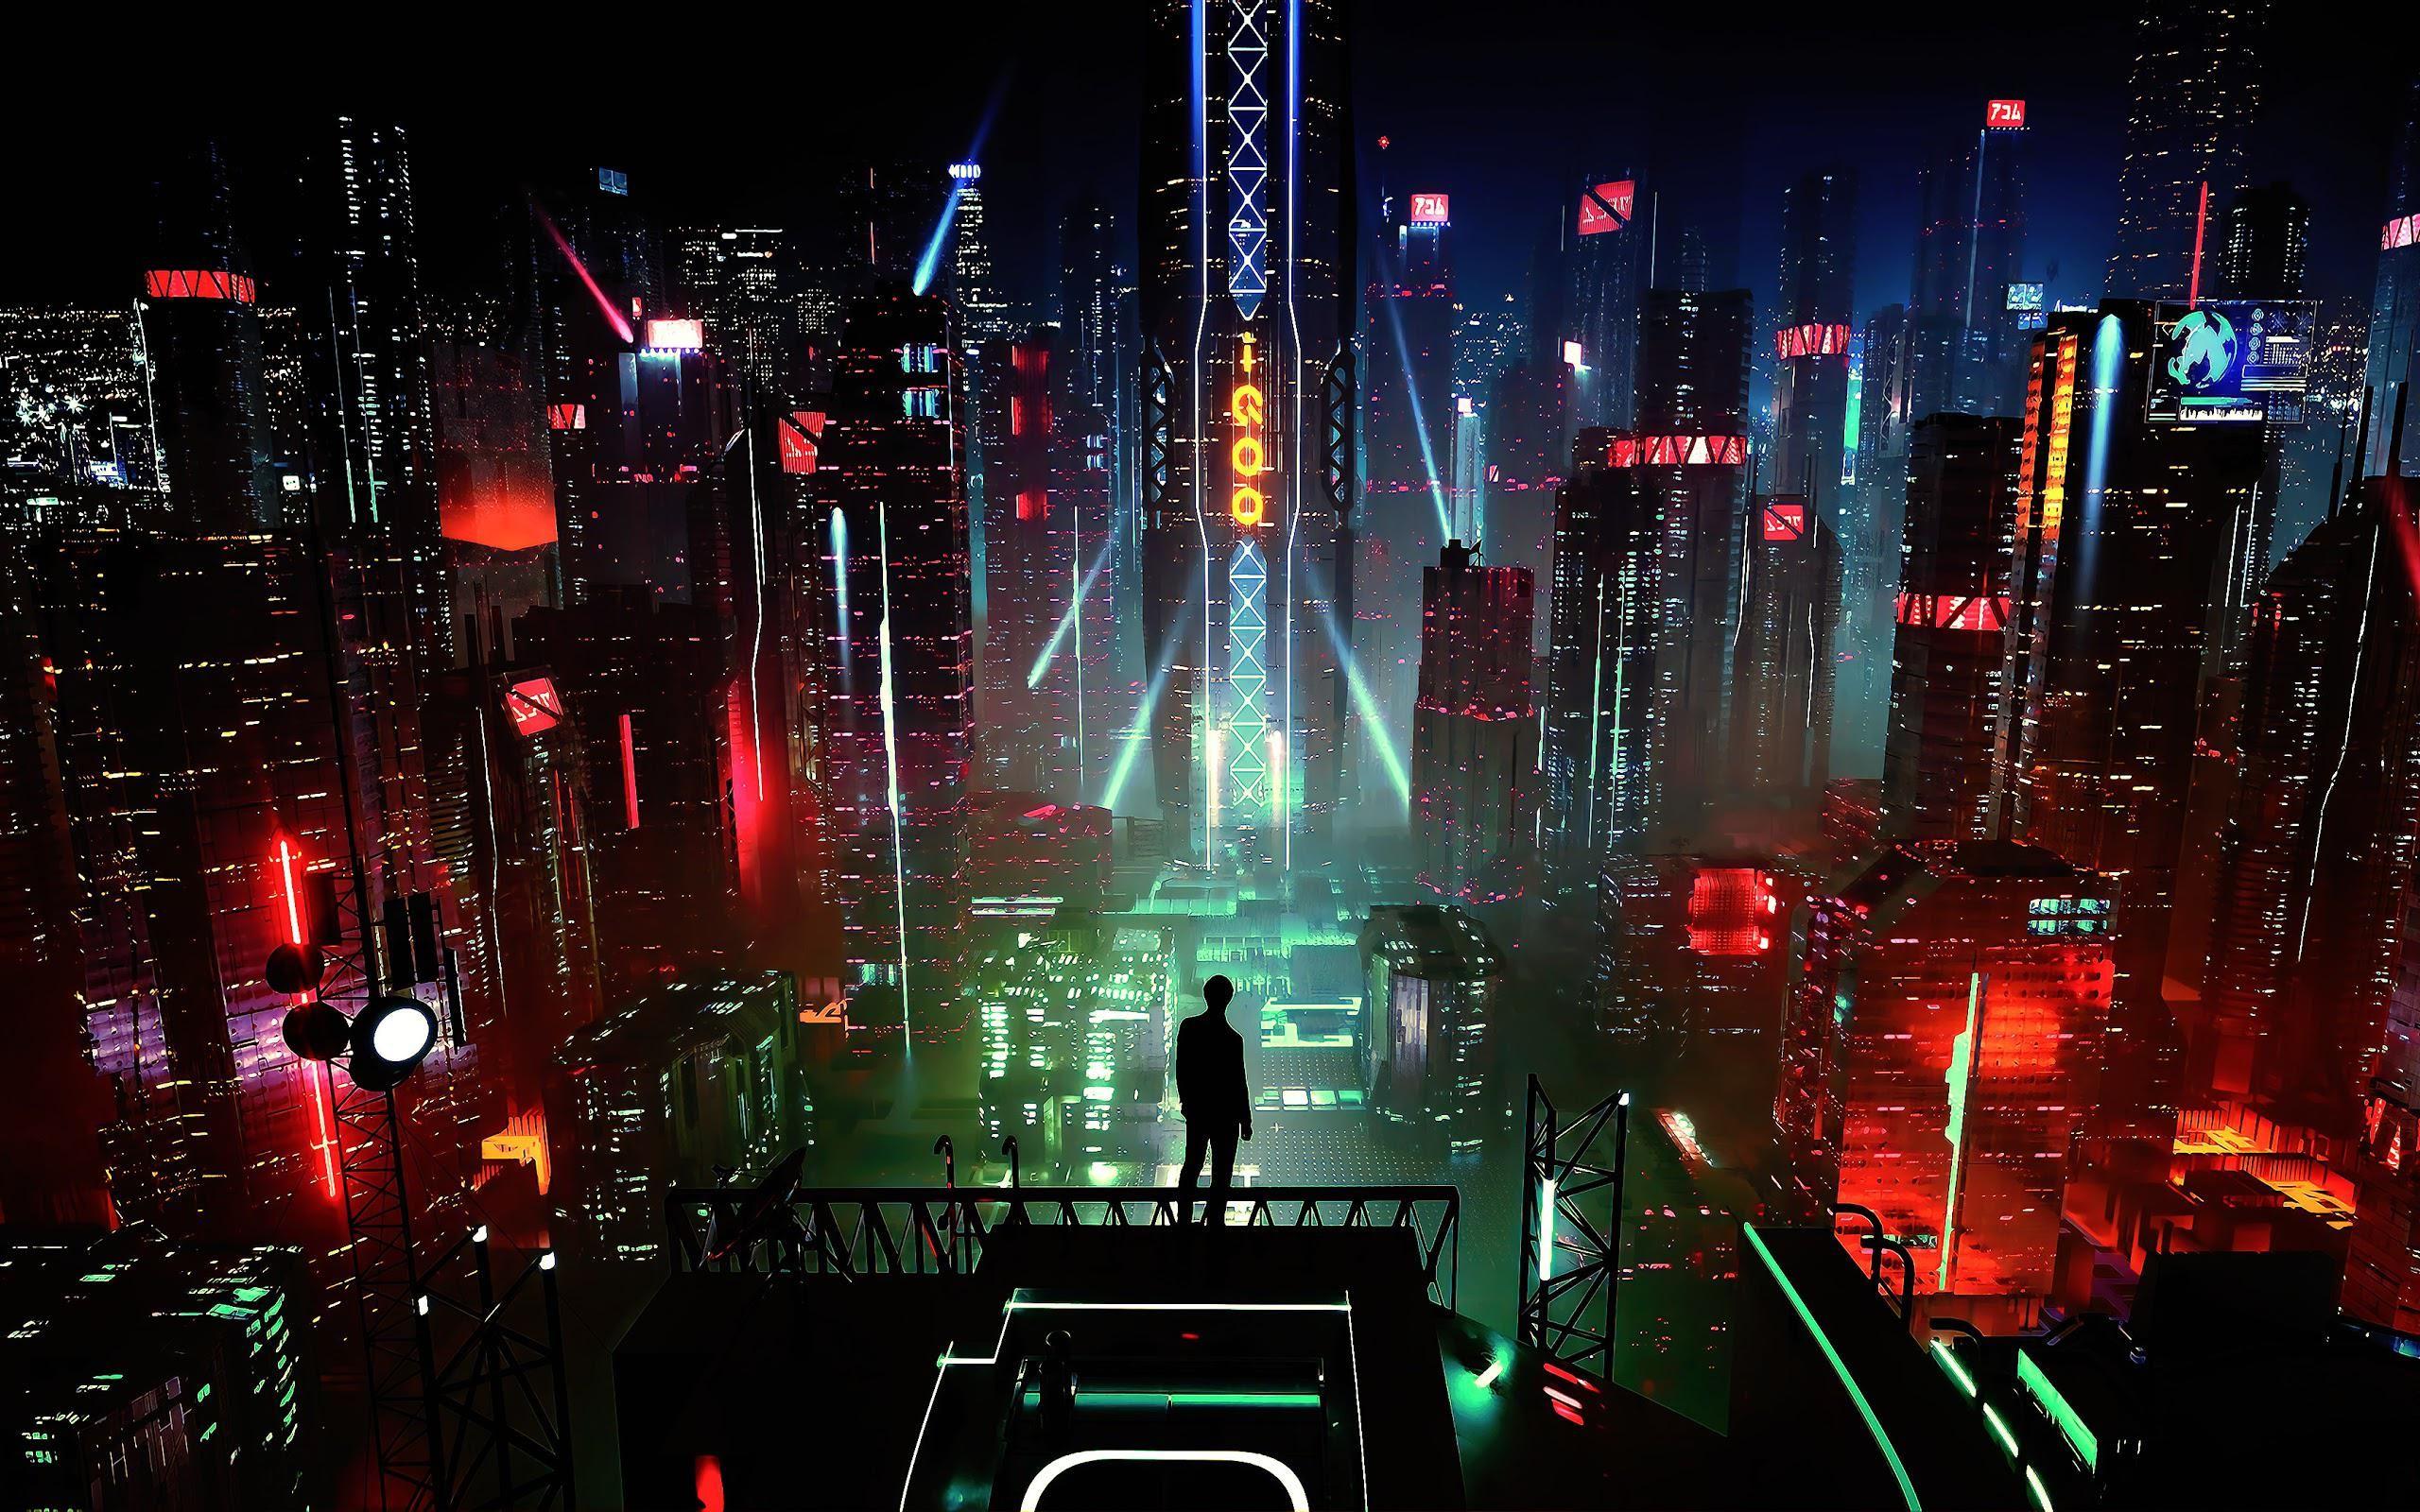 Night City Buildings 2560x1600 In 2020 Concept Art Wallpaper Hd Wallpaper